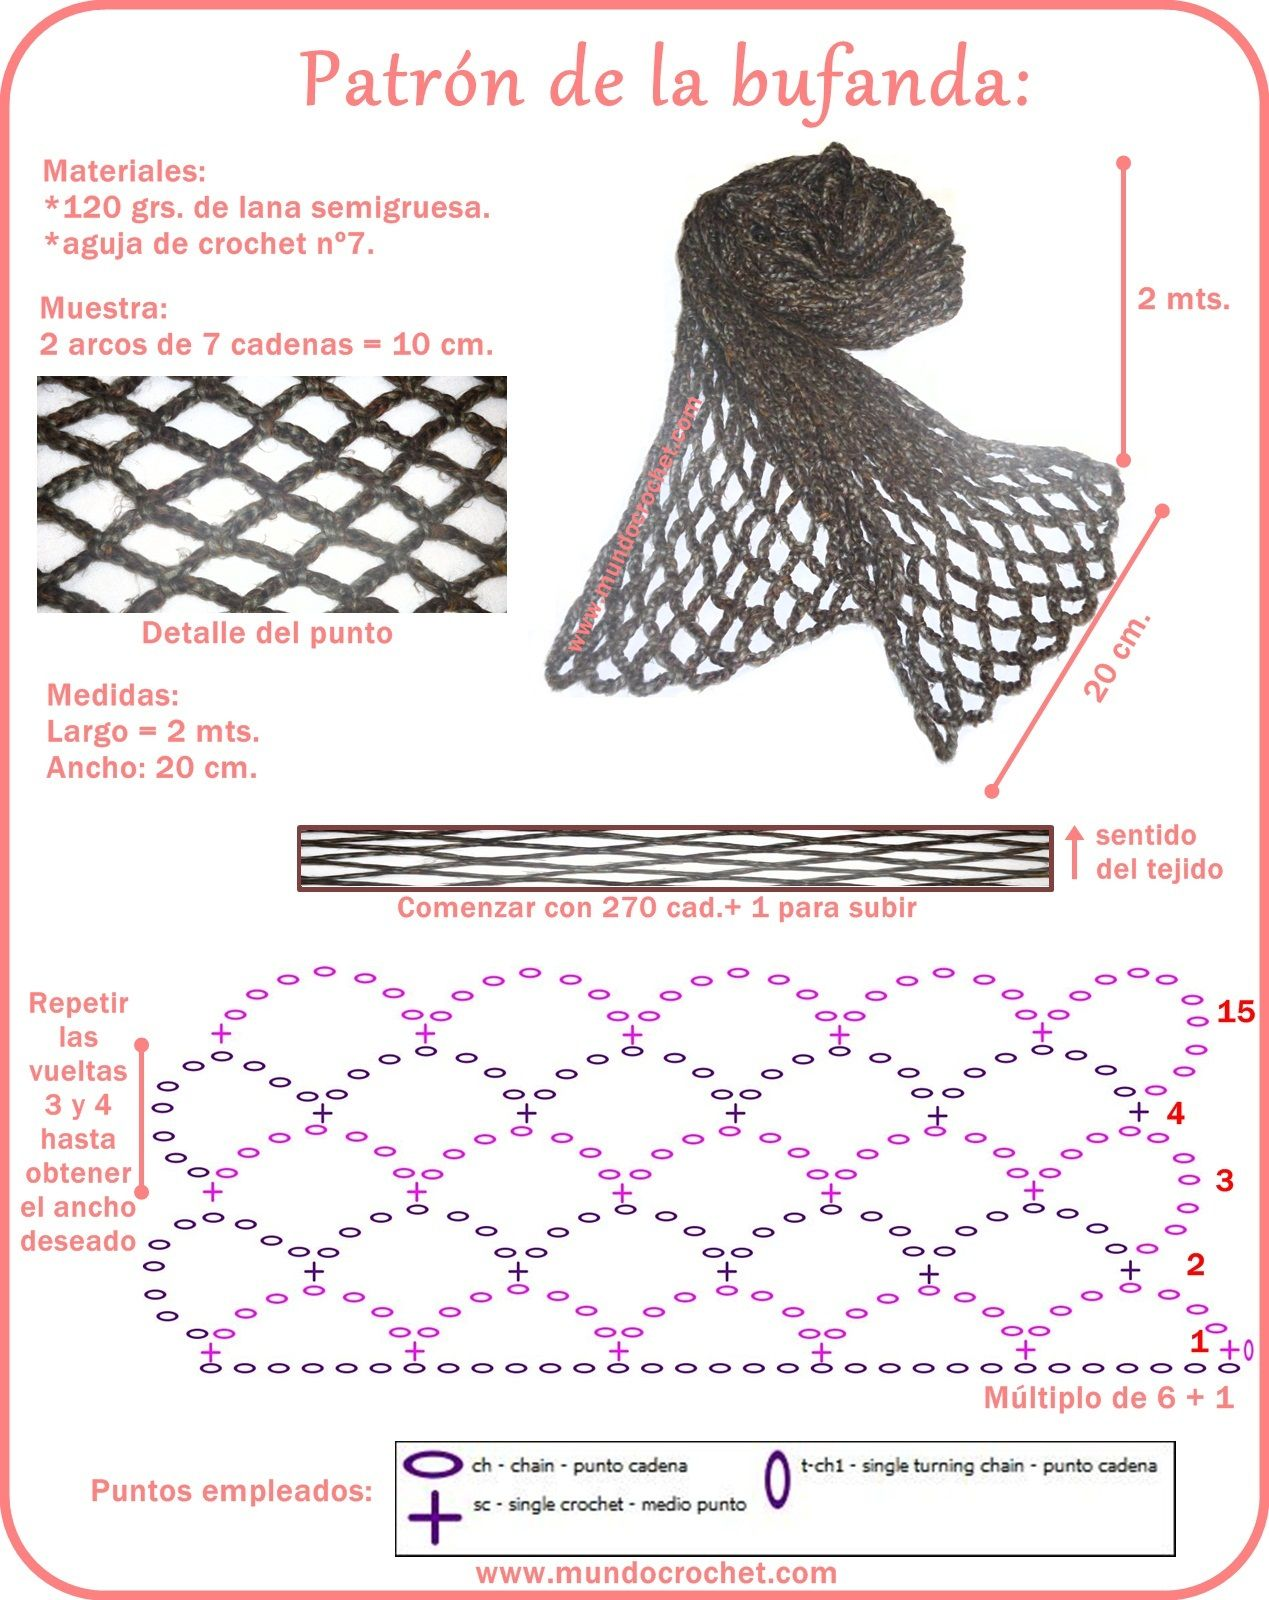 Bufanda sencilla en punto red - Mundo Crochet | Crochet | Ganchillo ...